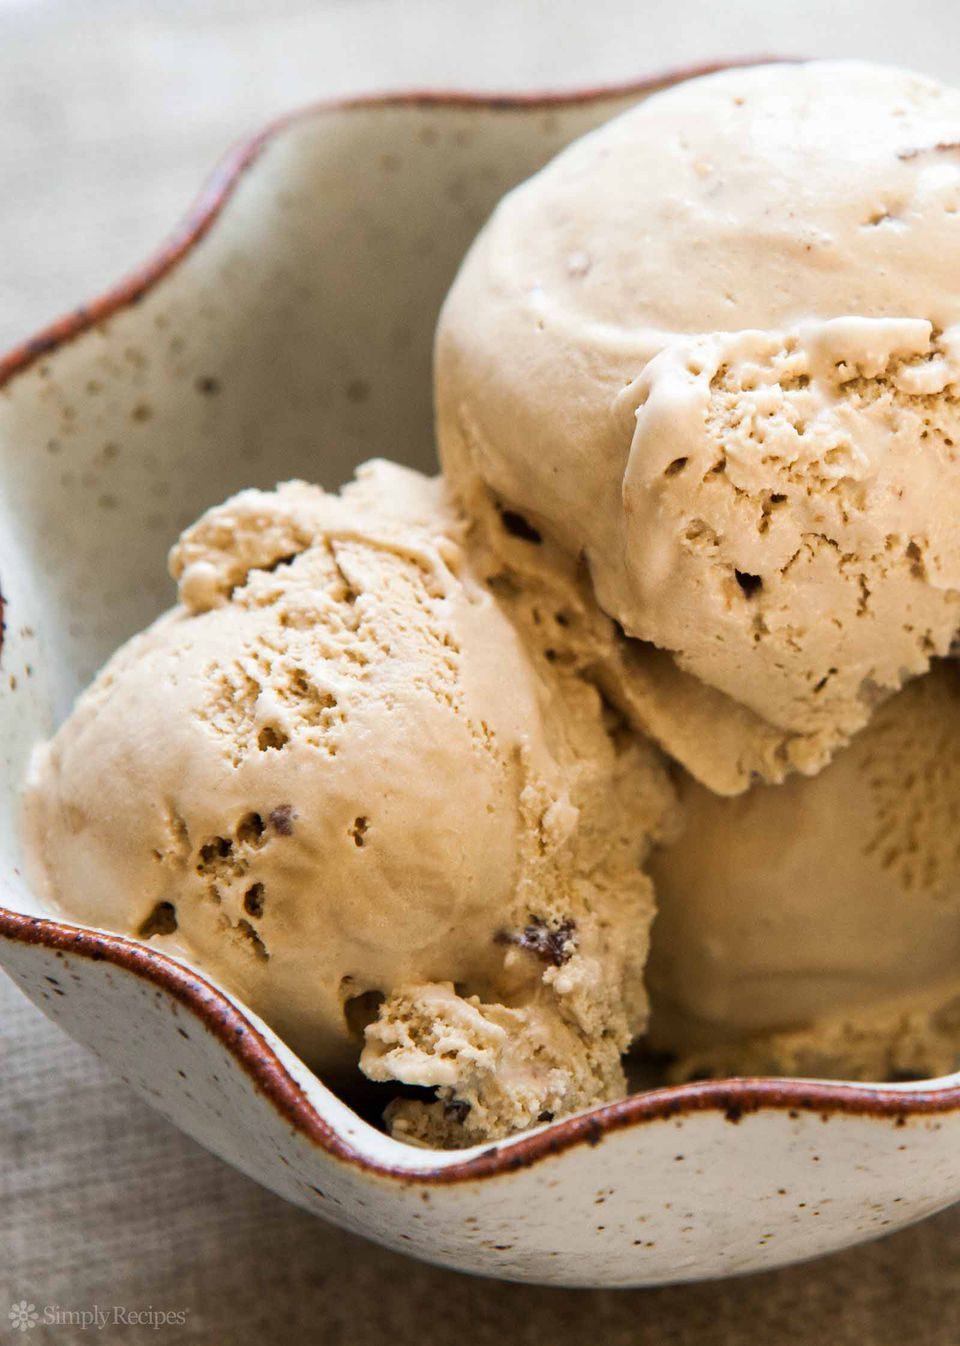 Coffee Heath Bar Ice Cream